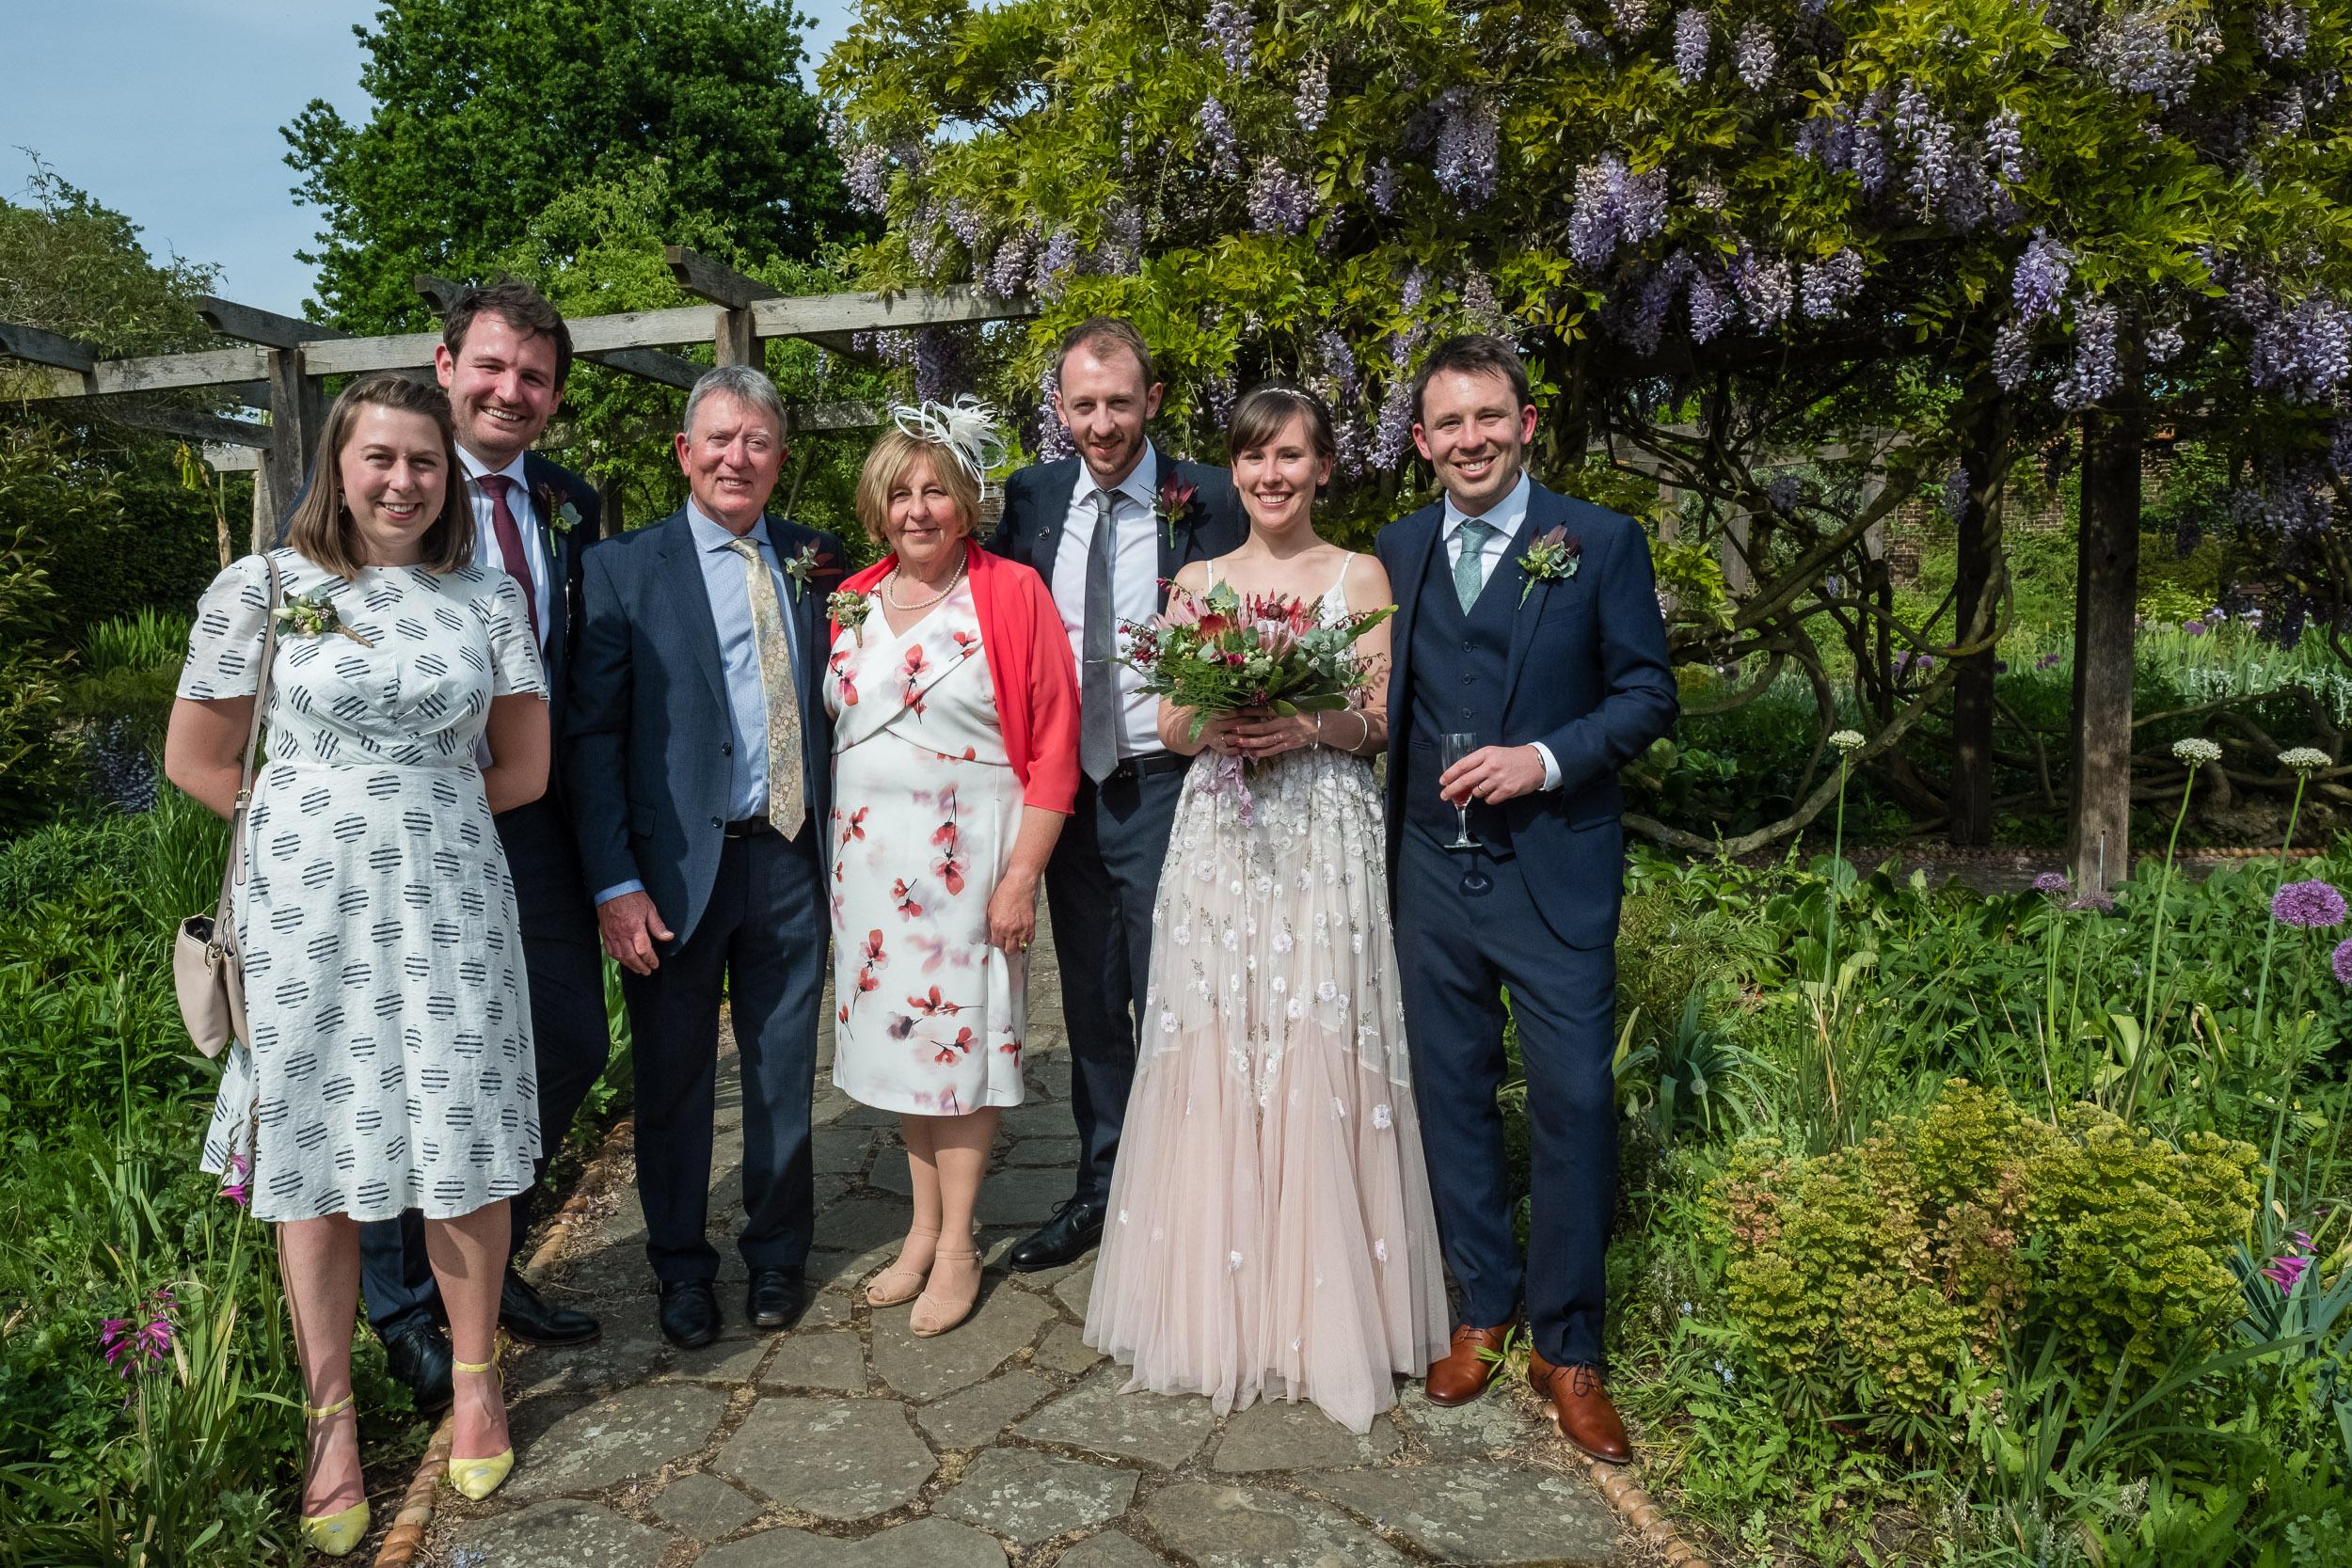 brockwell-lido-brixton-herne-hill-wedding-256.jpg